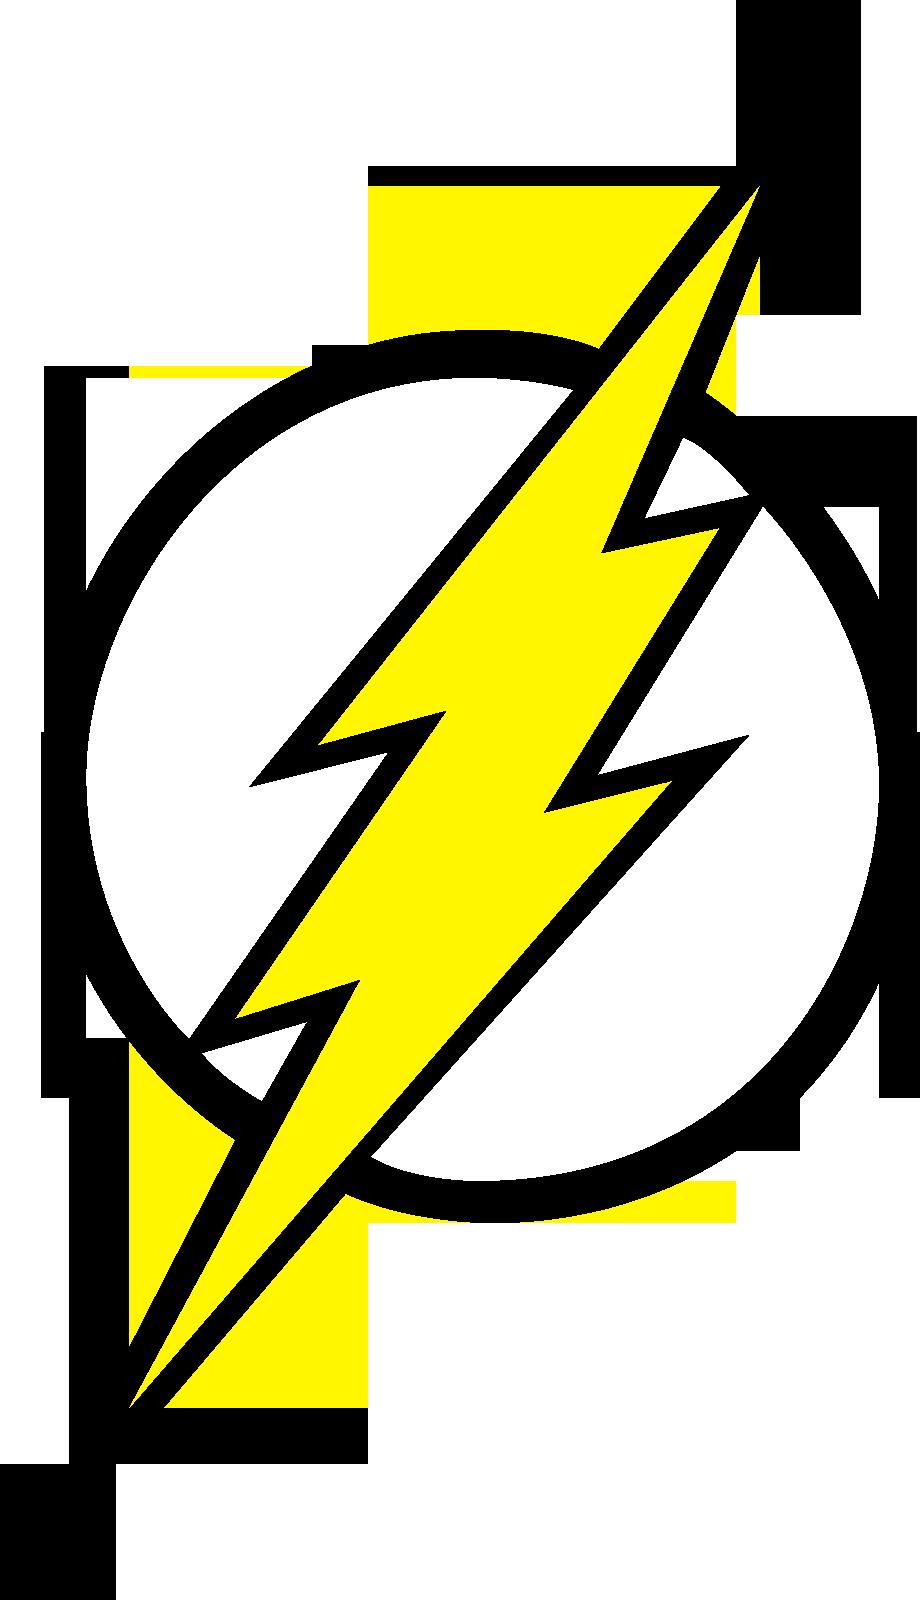 Pin By Jacqueline Runco On Diy T Shirt Ideas Flash Superhero Flash Logo Flash Costume